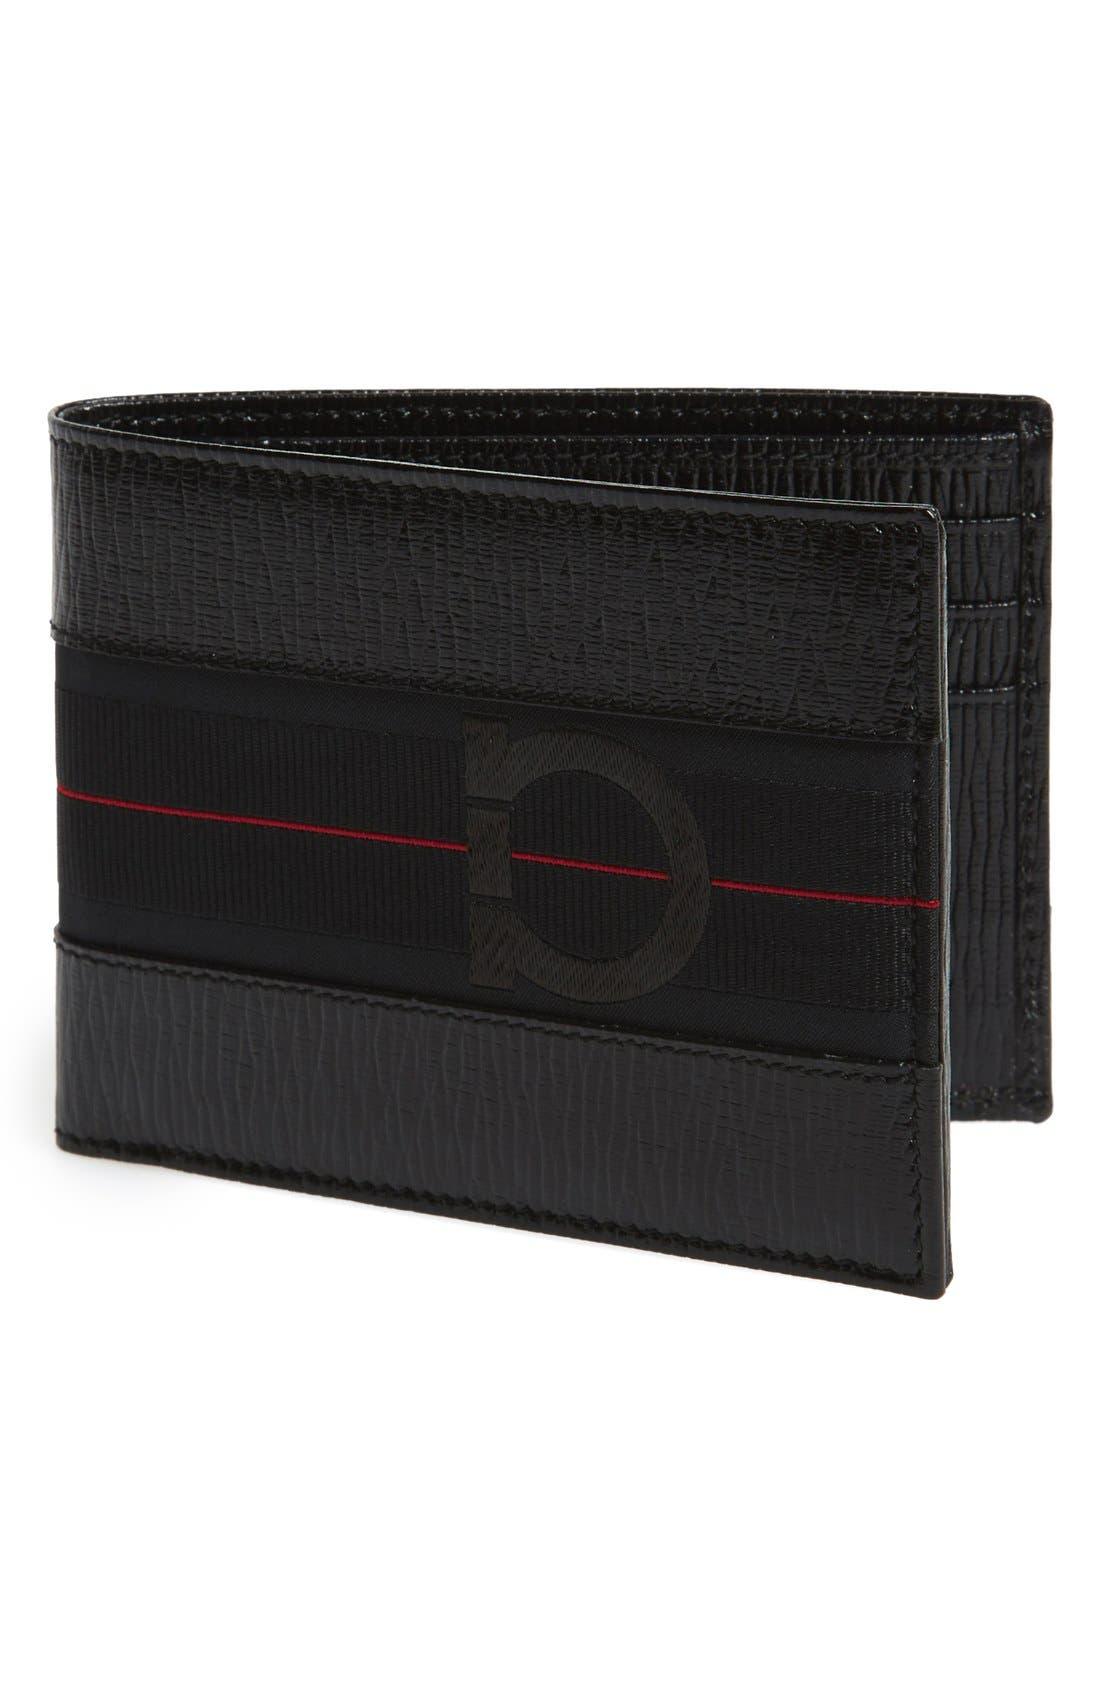 Alternate Image 1 Selected - Salvatore Ferragamo 'Revival' Wallet